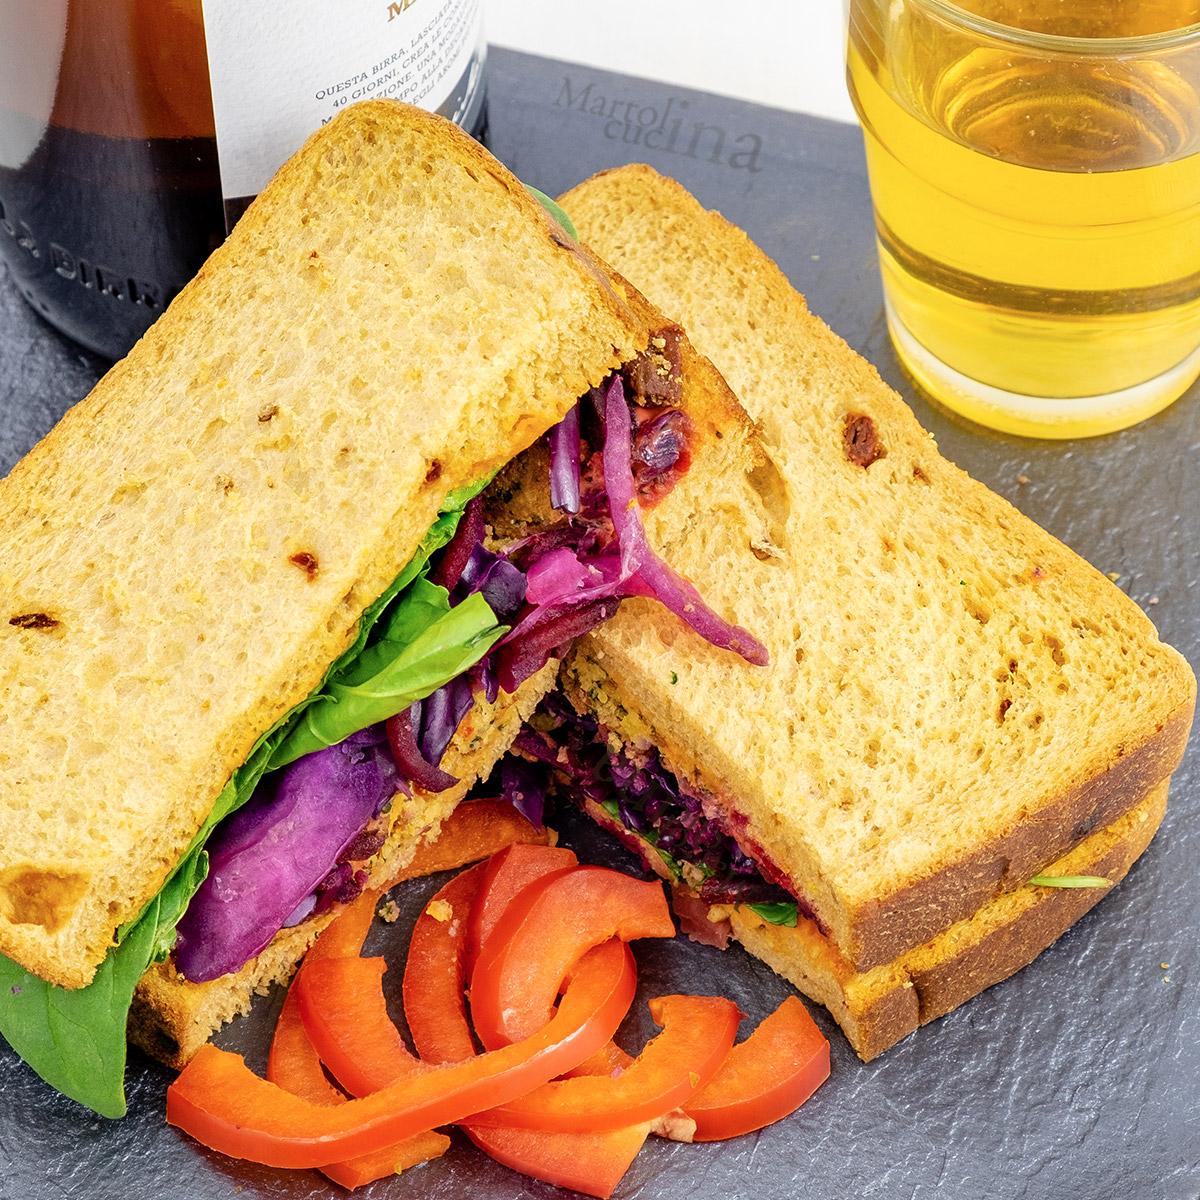 Sandwich con falafel